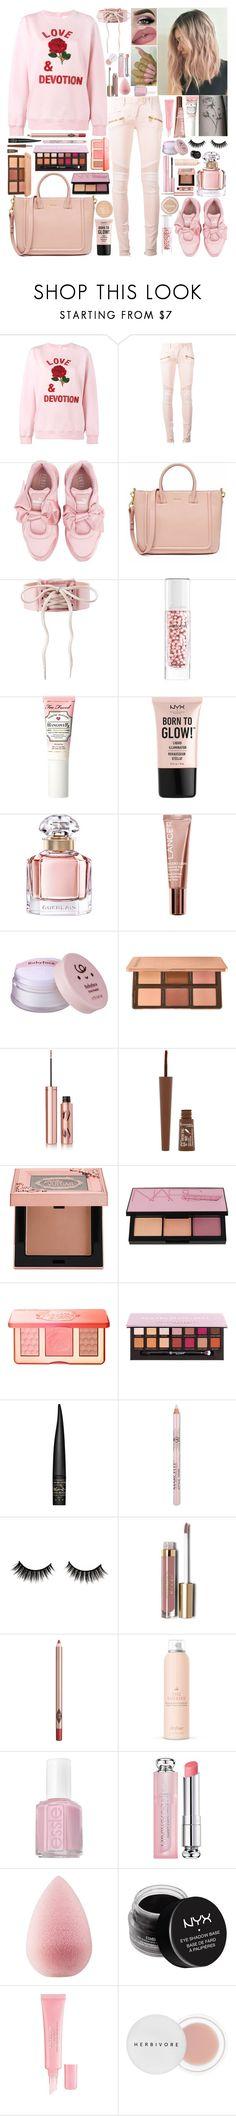 """Pink of Me"" by girlygirlprincess ❤ liked on Polyvore featuring Ashish, Balmain, Puma, Guerlain, Too Faced Cosmetics, NYX, Lumi, Lancer Dermatology, Charlotte Tilbury and Rimmel"